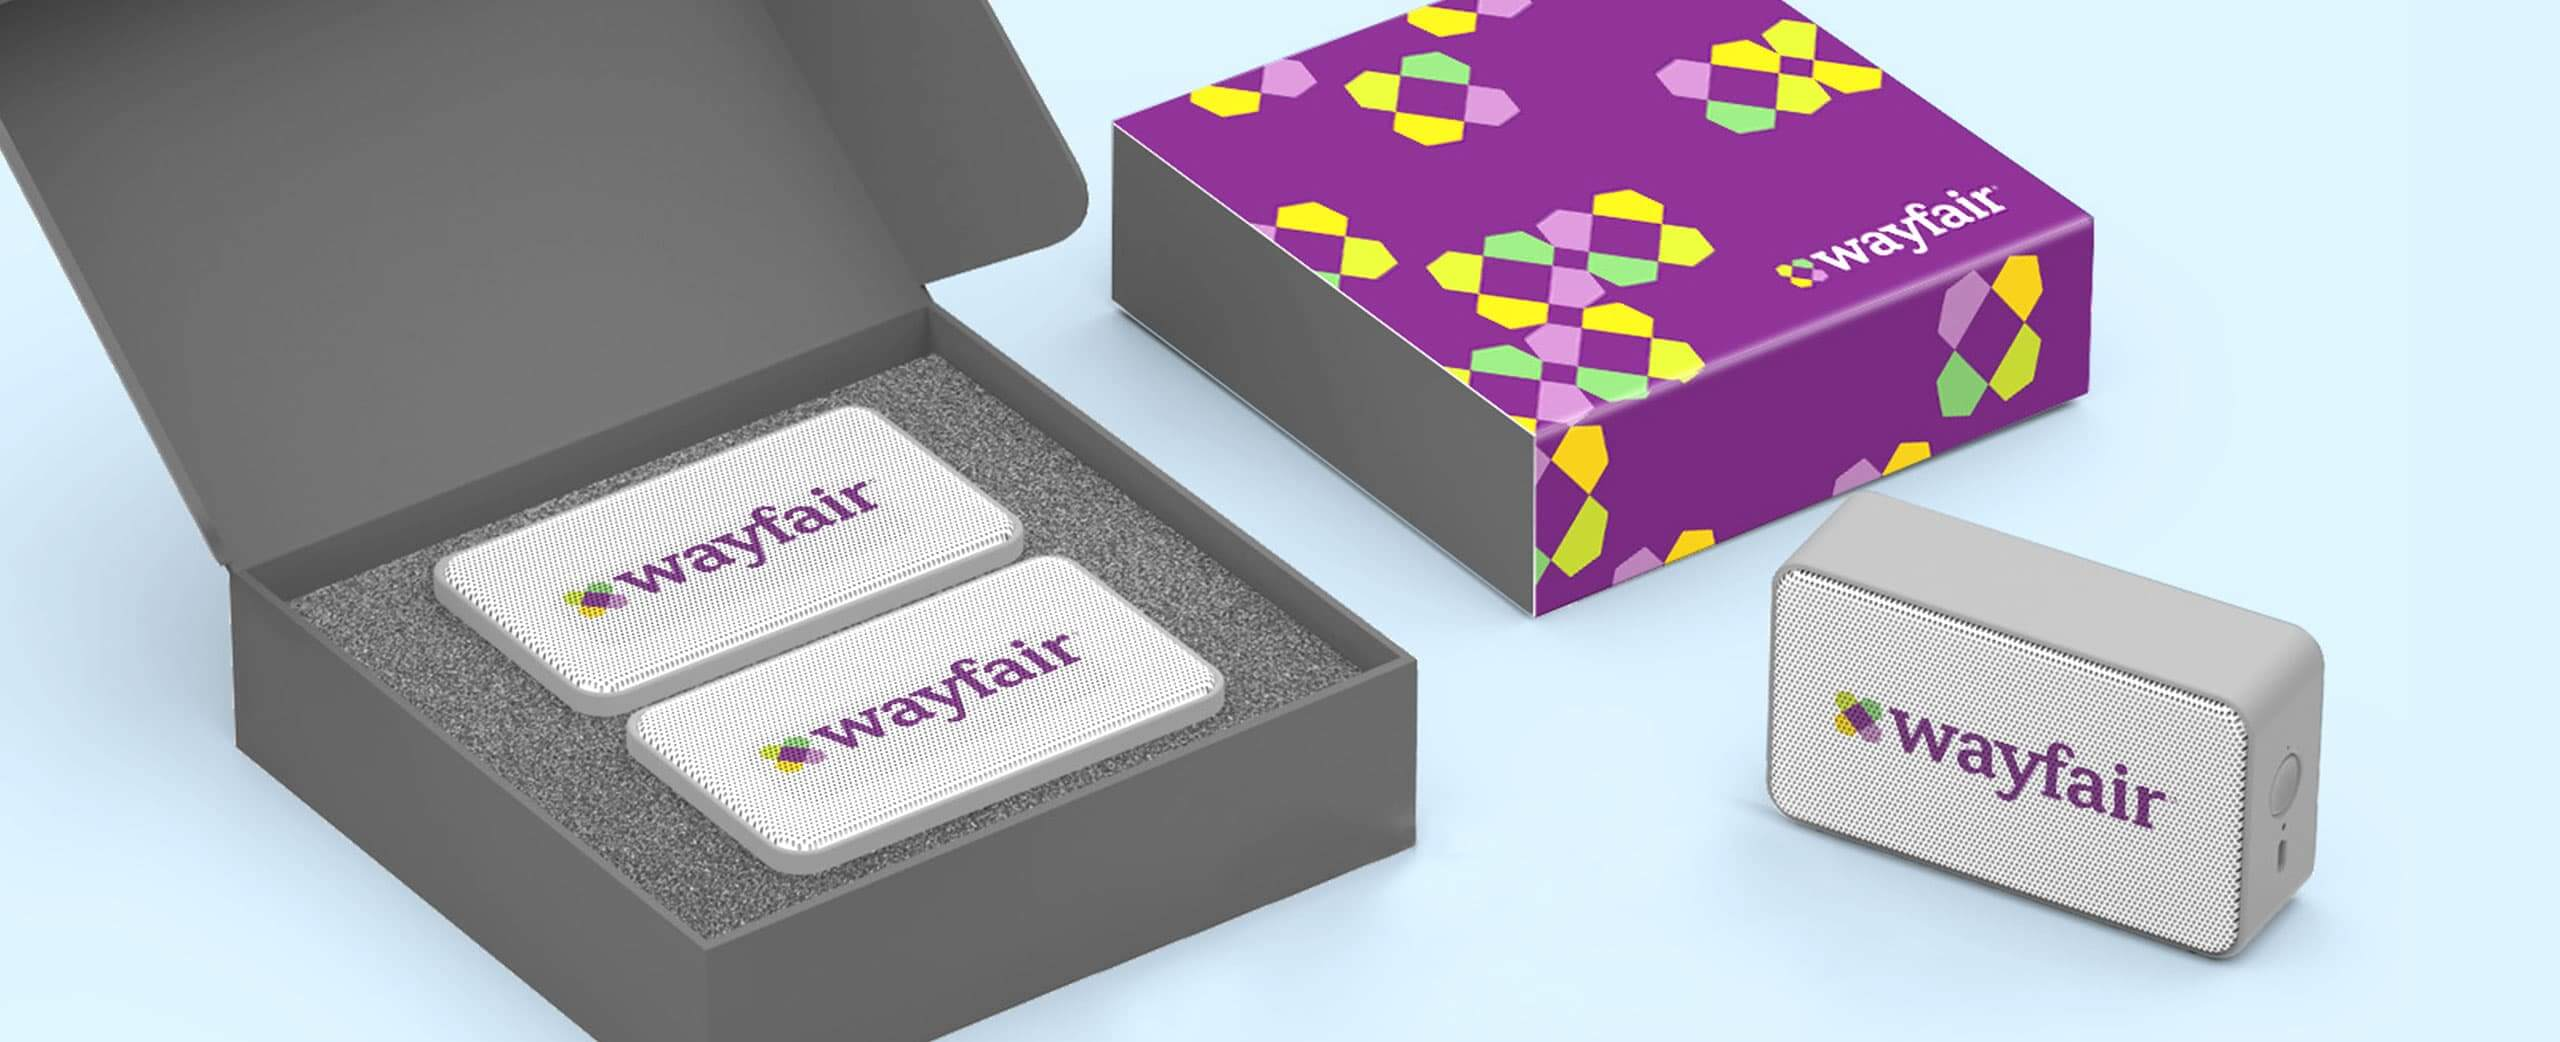 wayfair_speaker